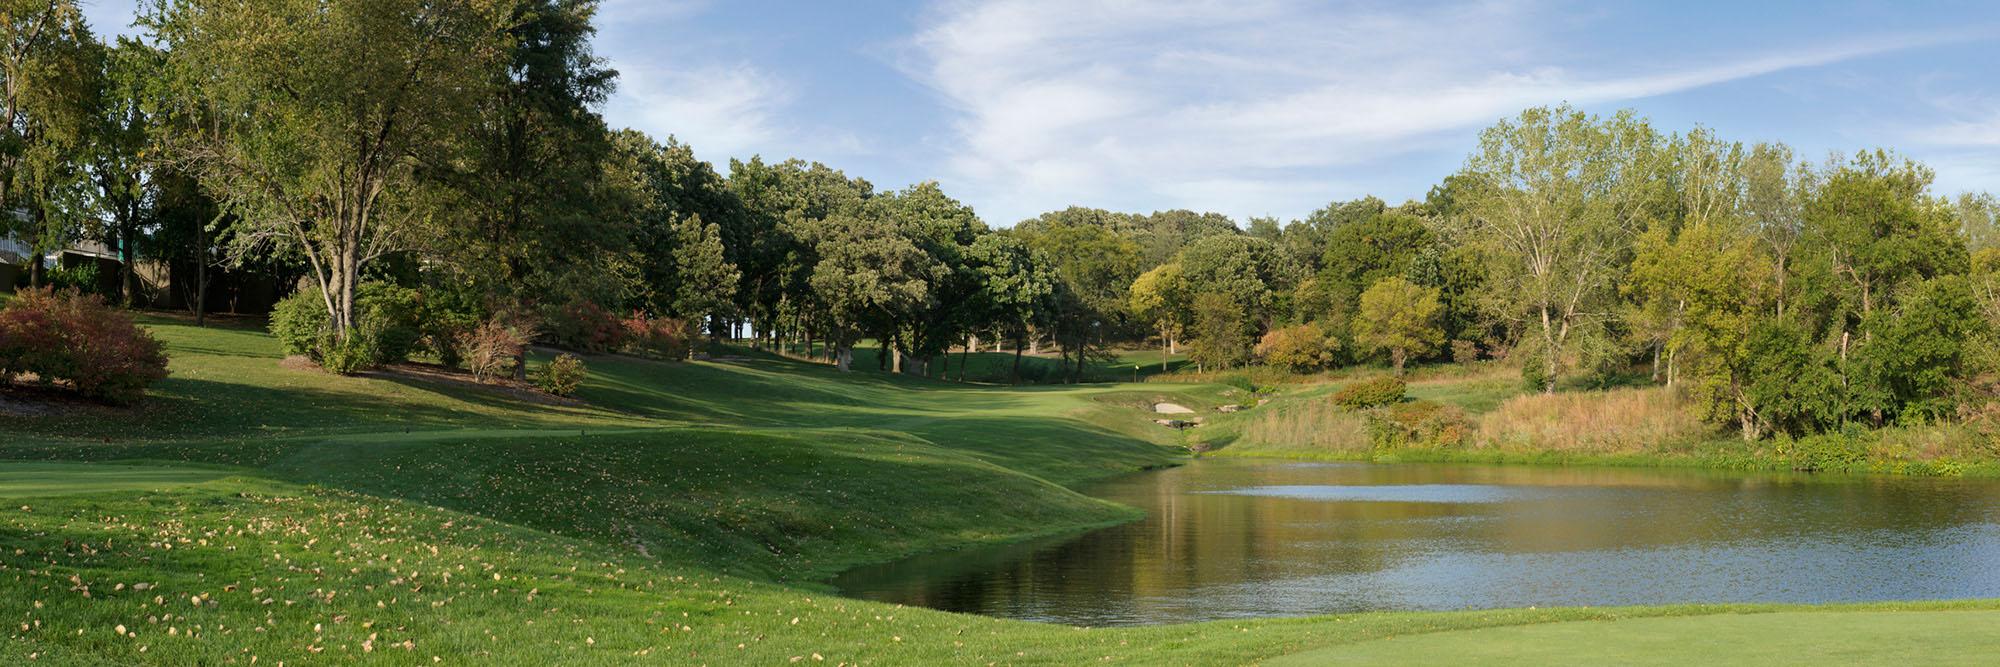 Golf Course Image - Glen Oaks No. 5